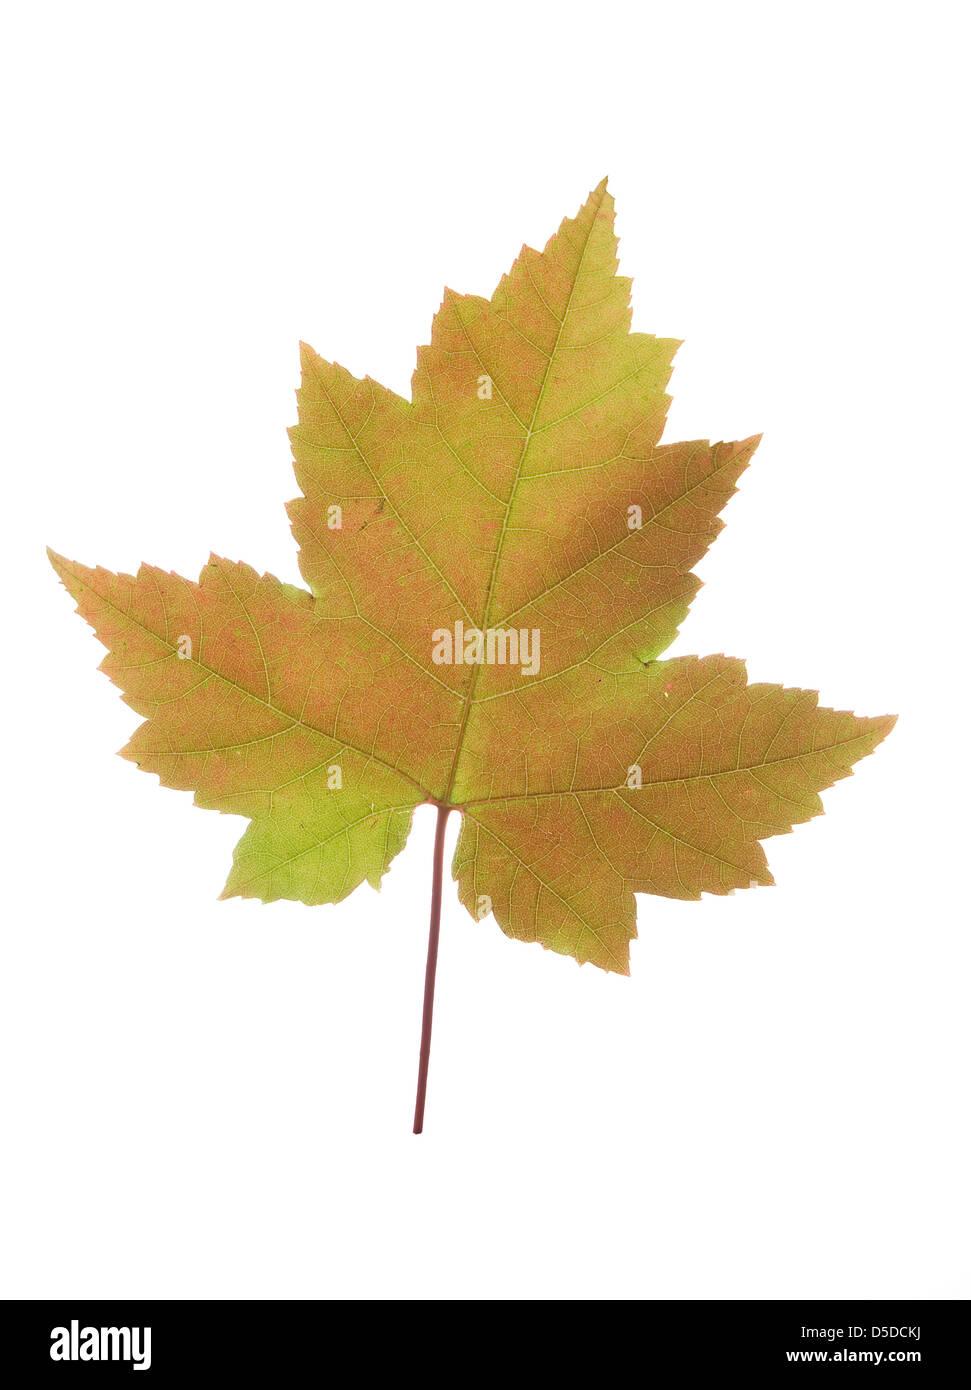 big colored maple leaf on white background - Stock Image